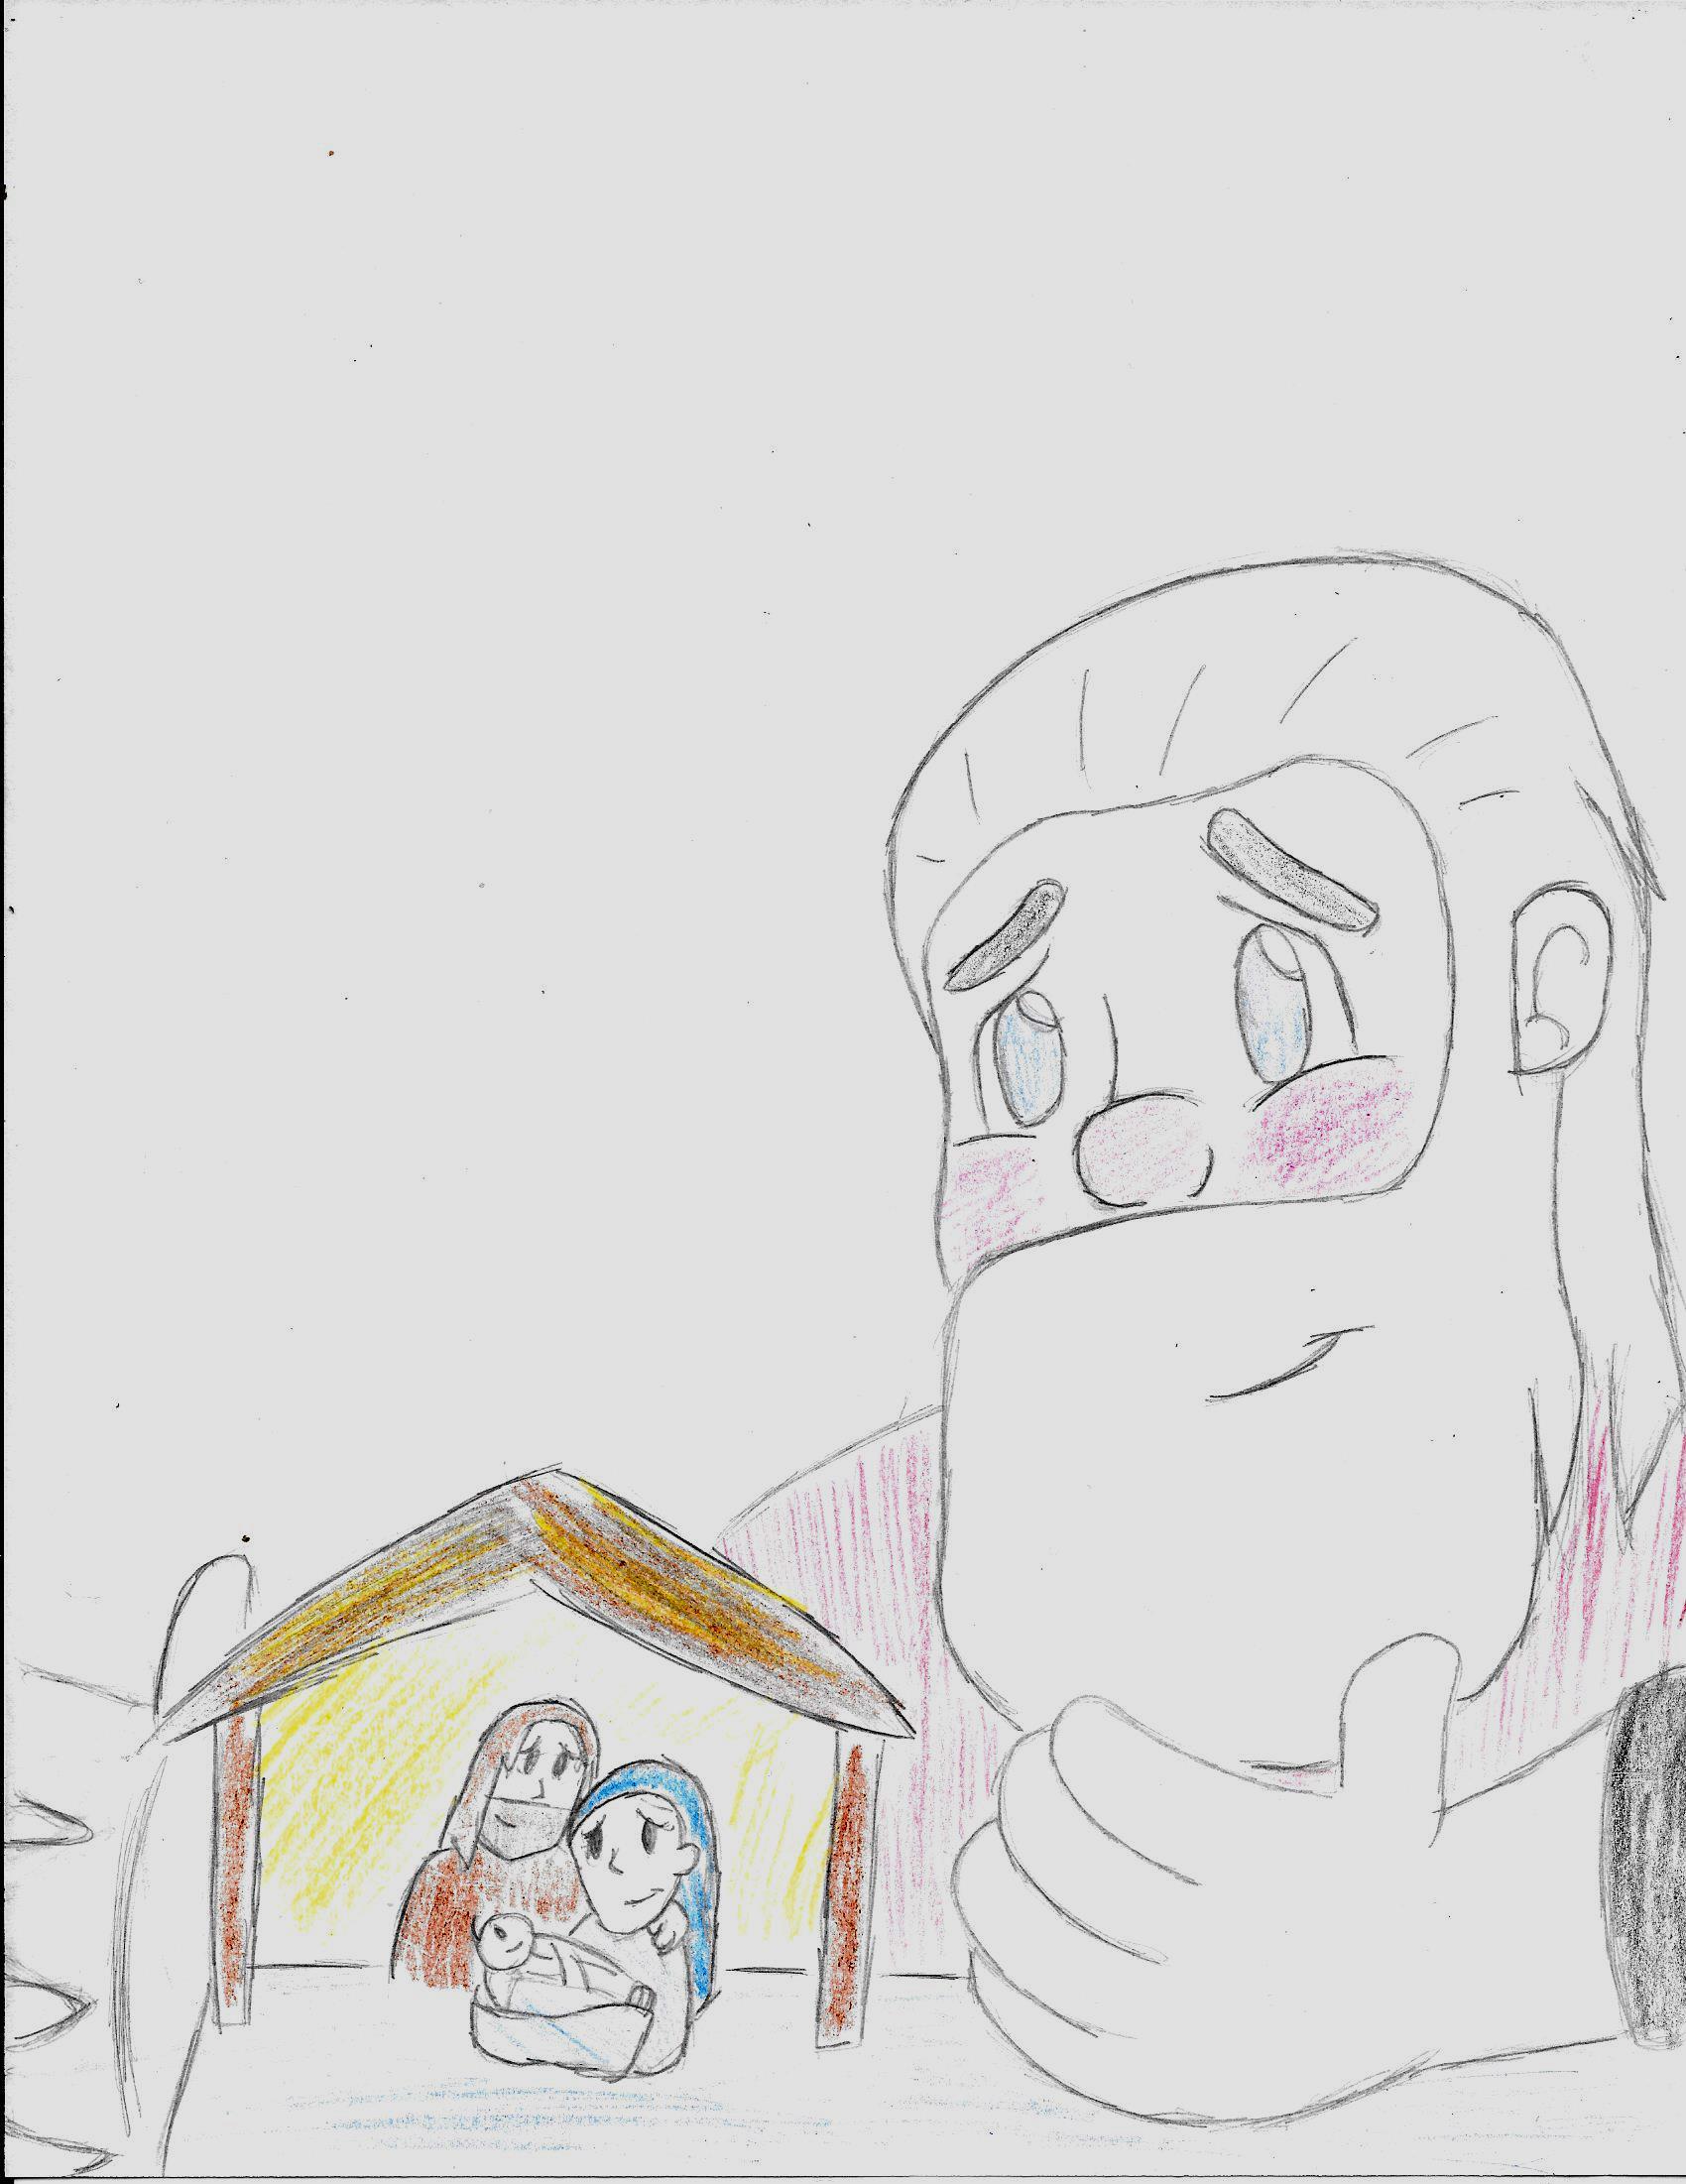 Santa Claus's gift of love